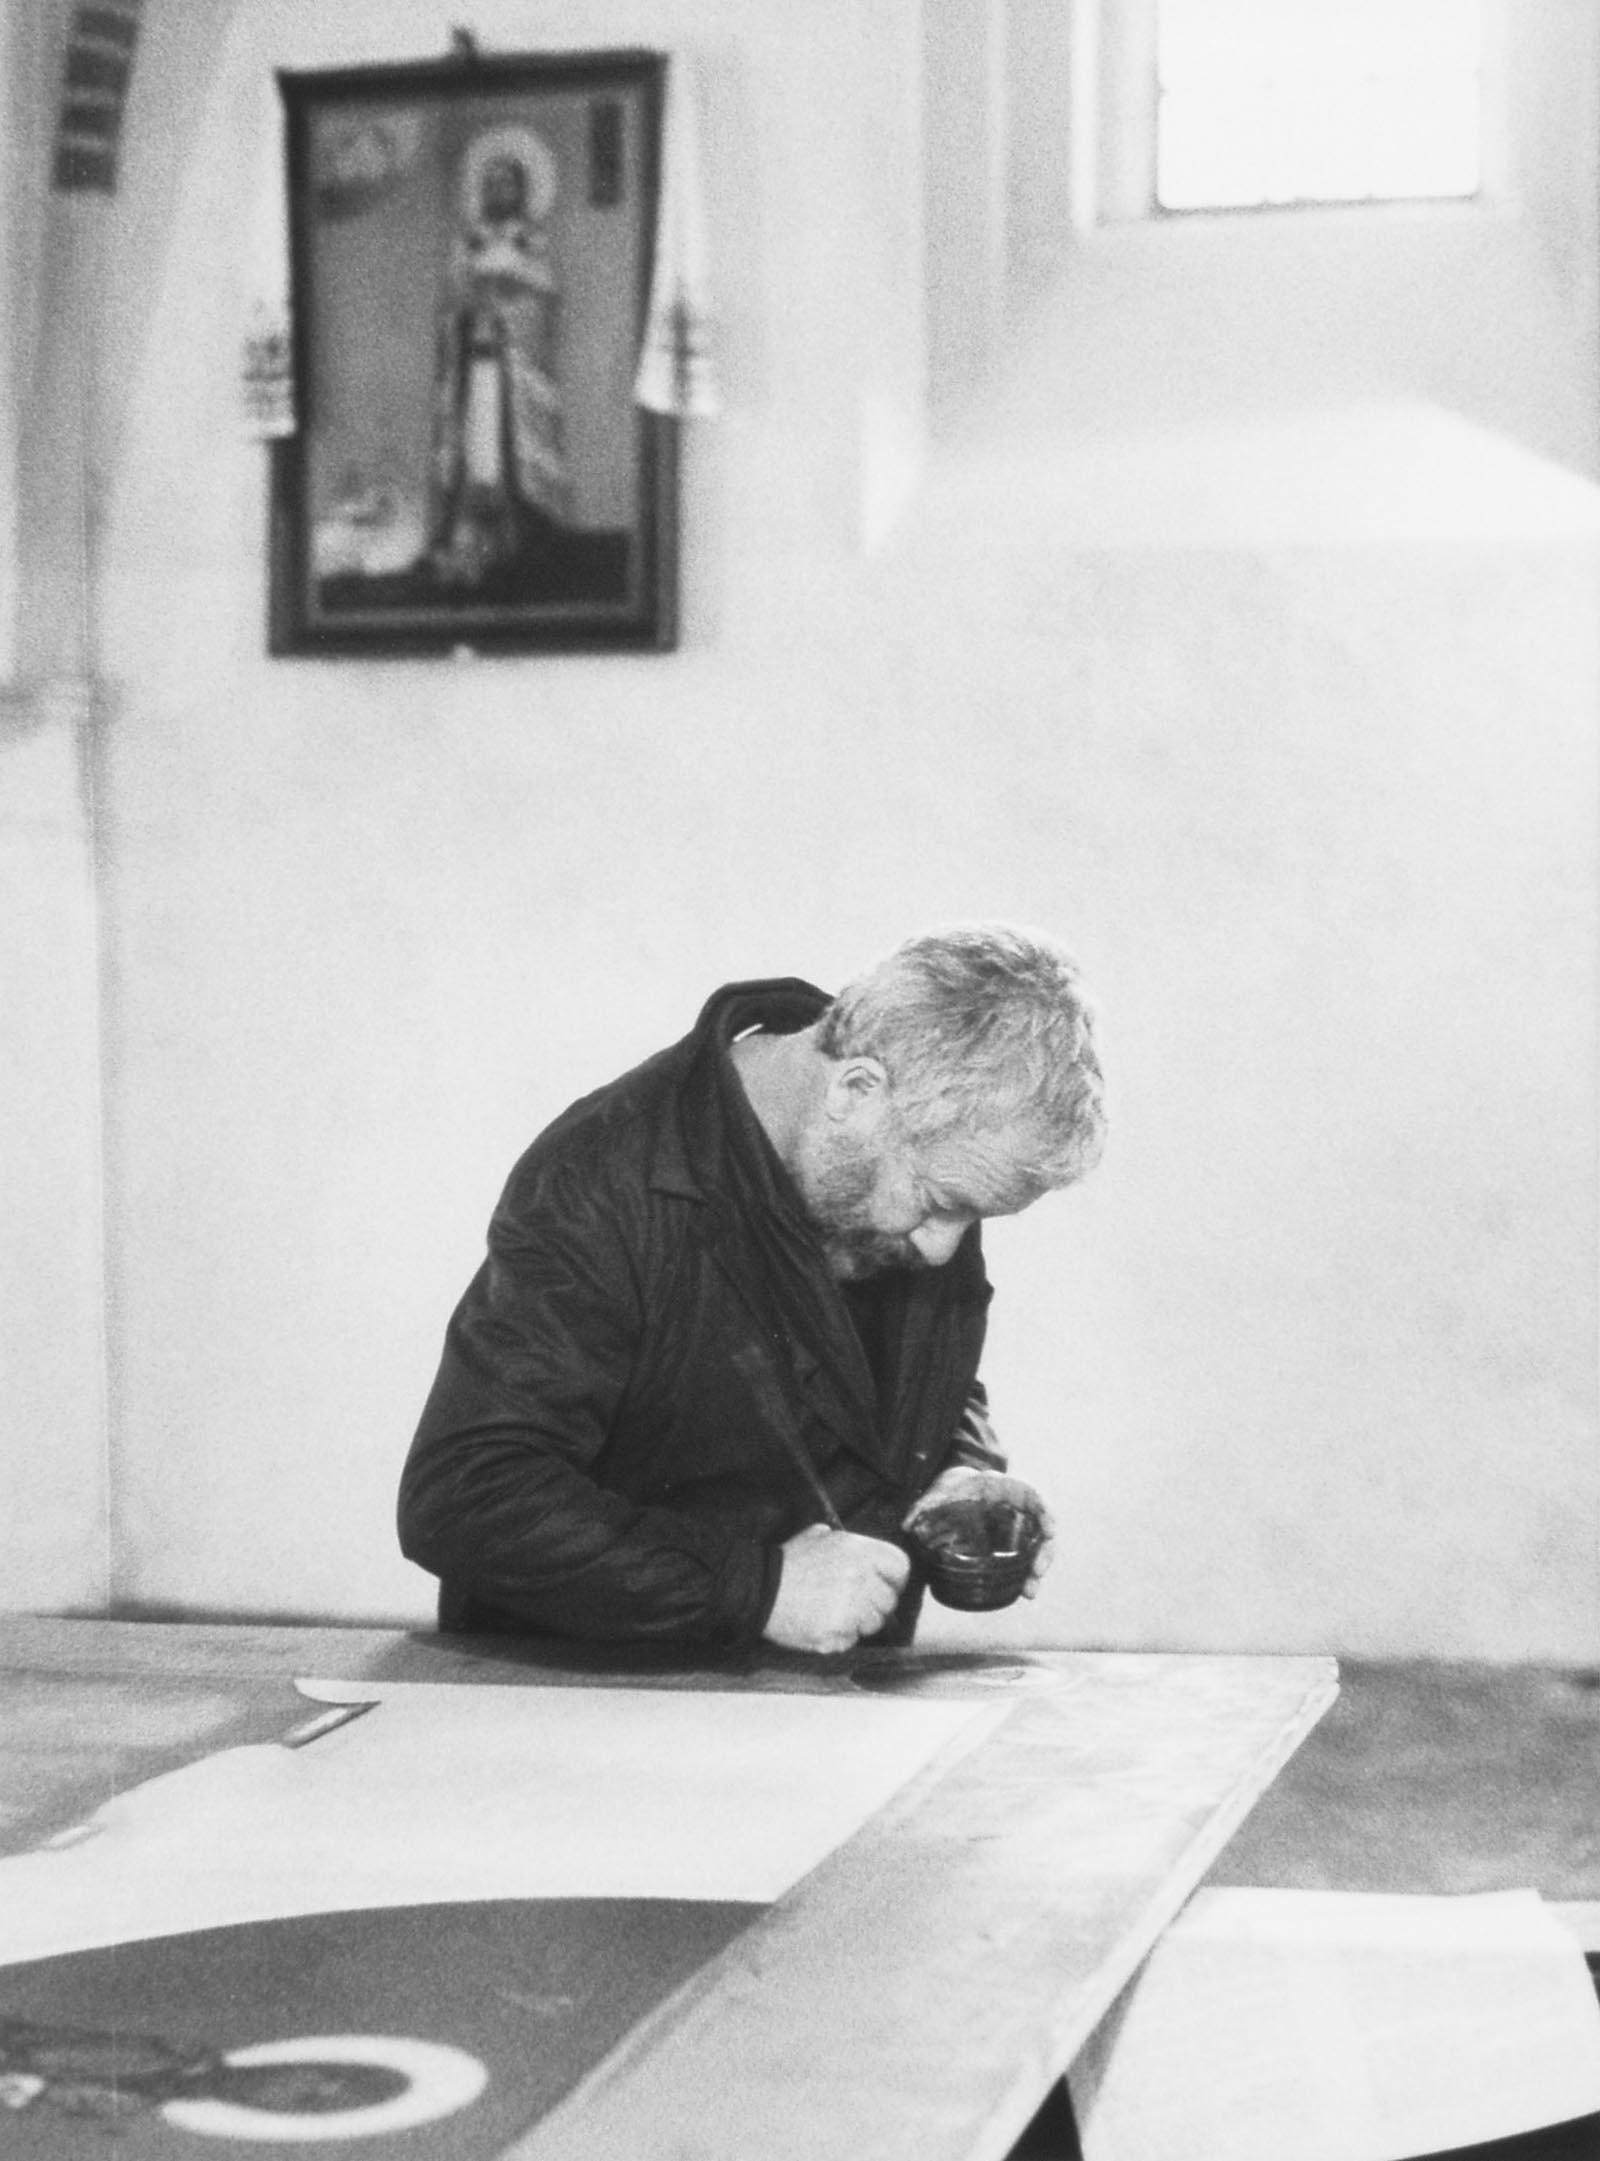 W cerkwi, 1989